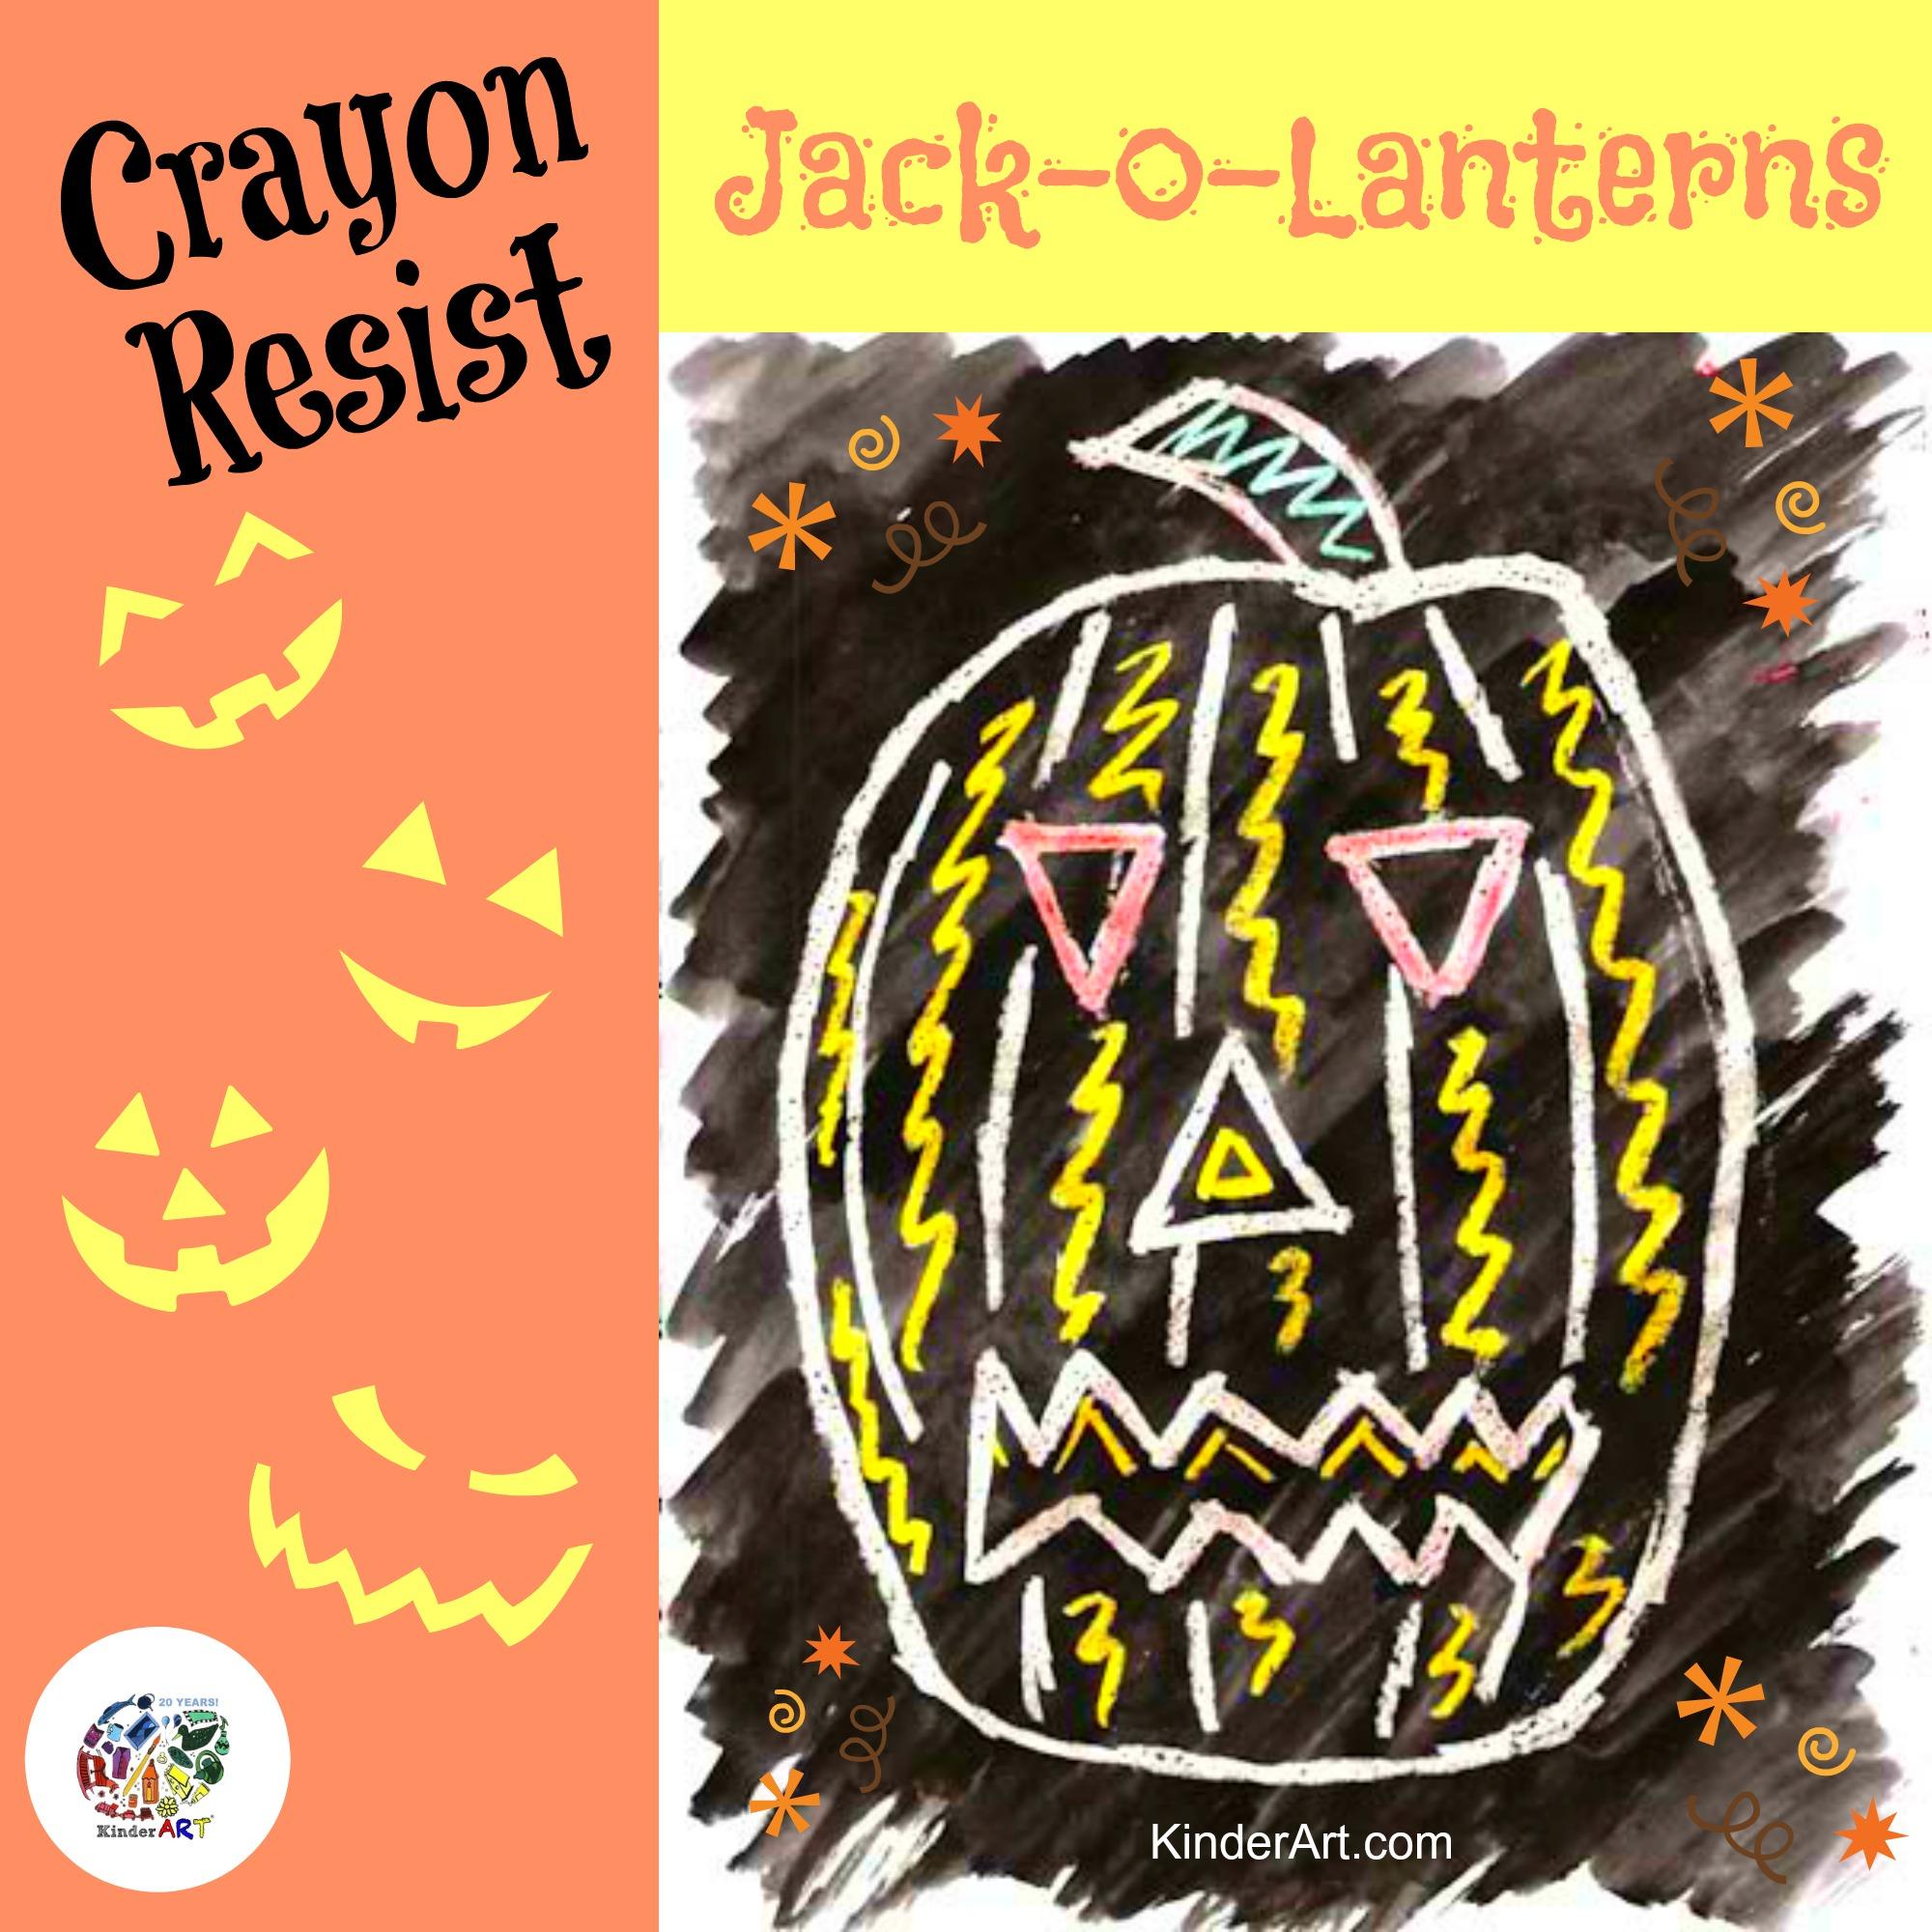 crayon_resist_jack